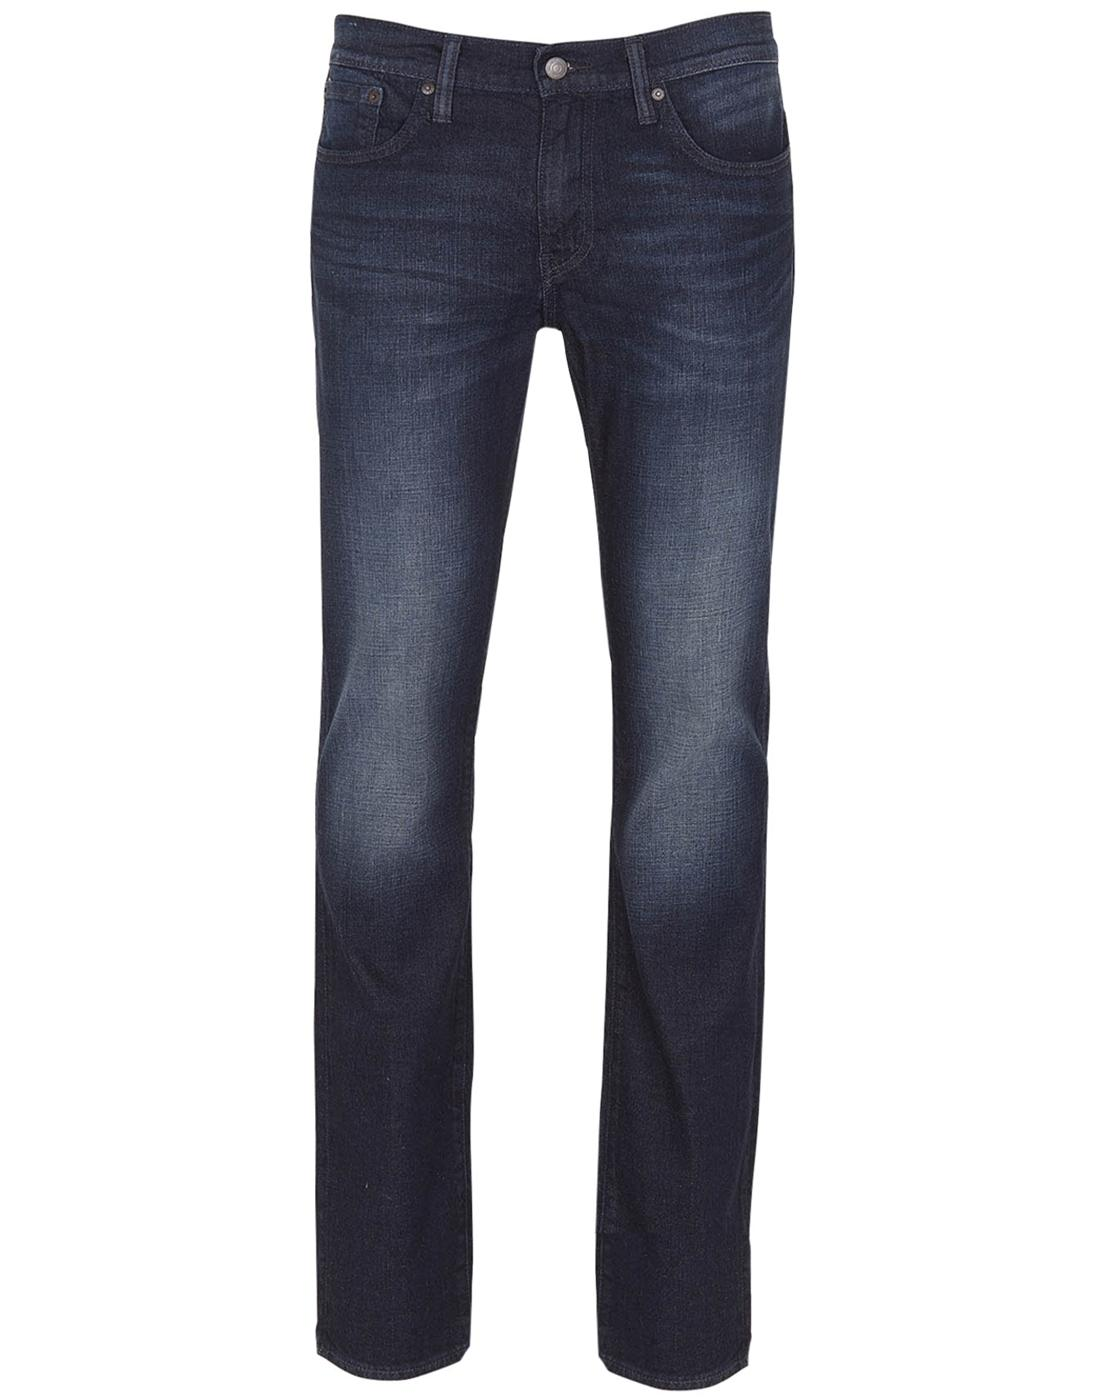 LEVI'S 511 Mens Slim Indigo Denim Jeans NIGHTMARE